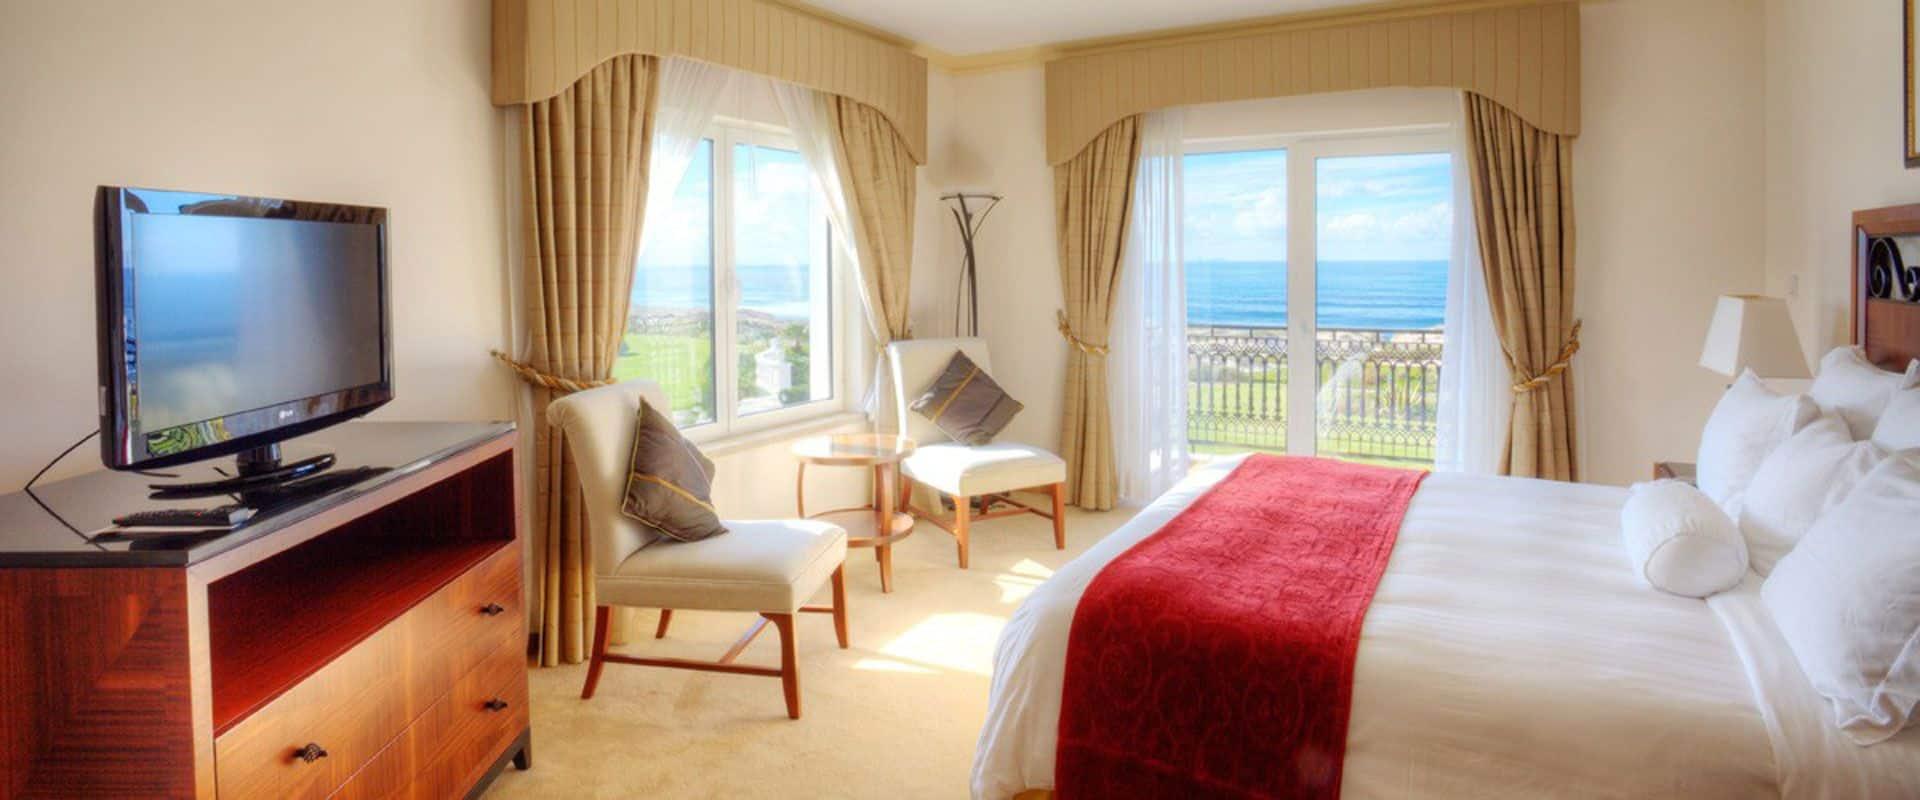 praia-del-rey-golf-beach-resort-053